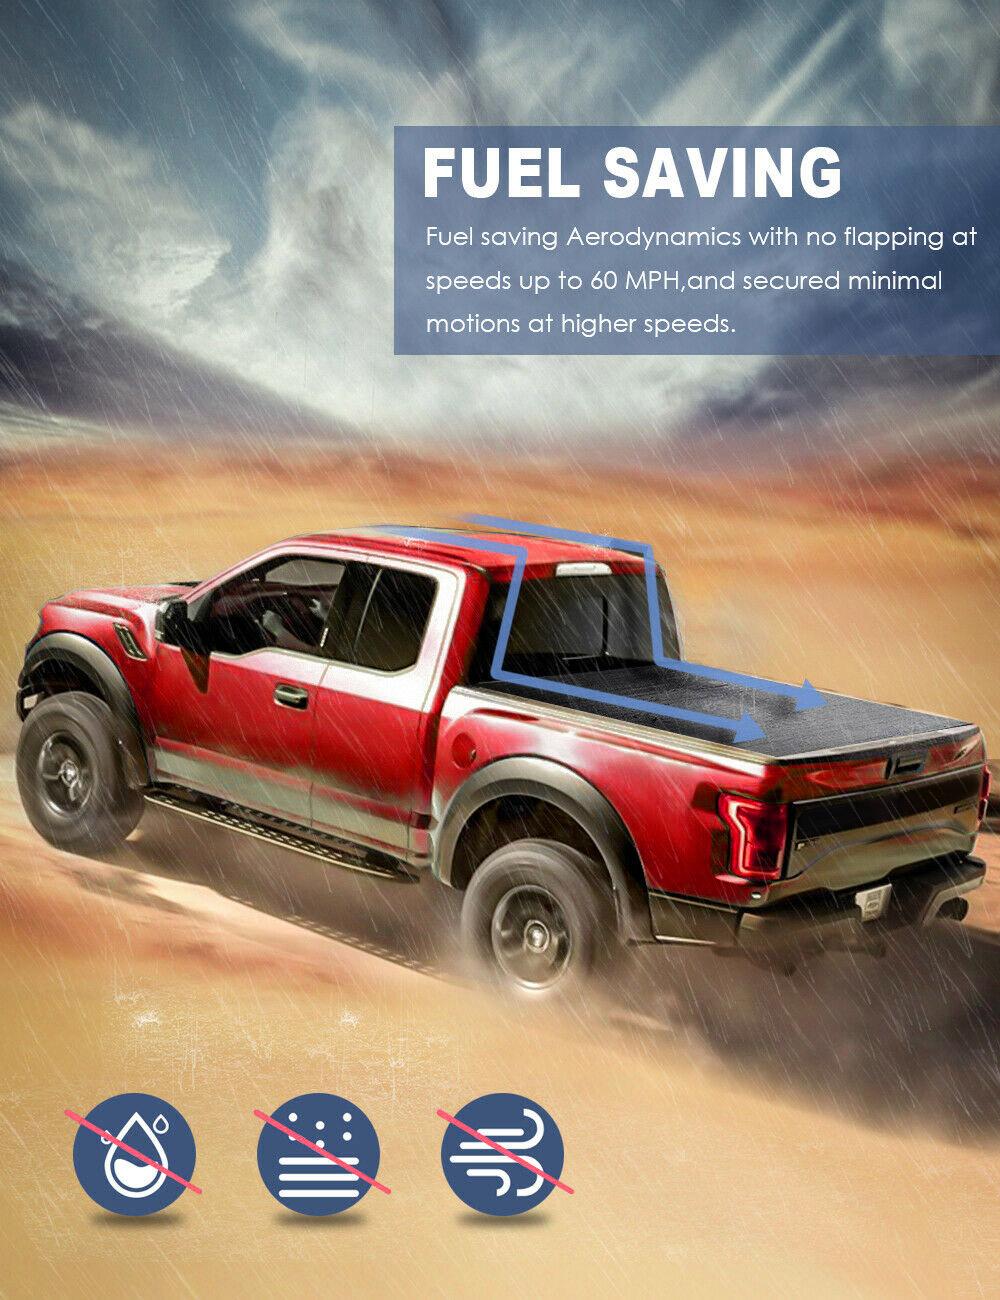 ::Truck Bed Tonneau Cover 4-FOLD 6.5FT For 2014-2019 Chevy Silverado / GMC Sierra